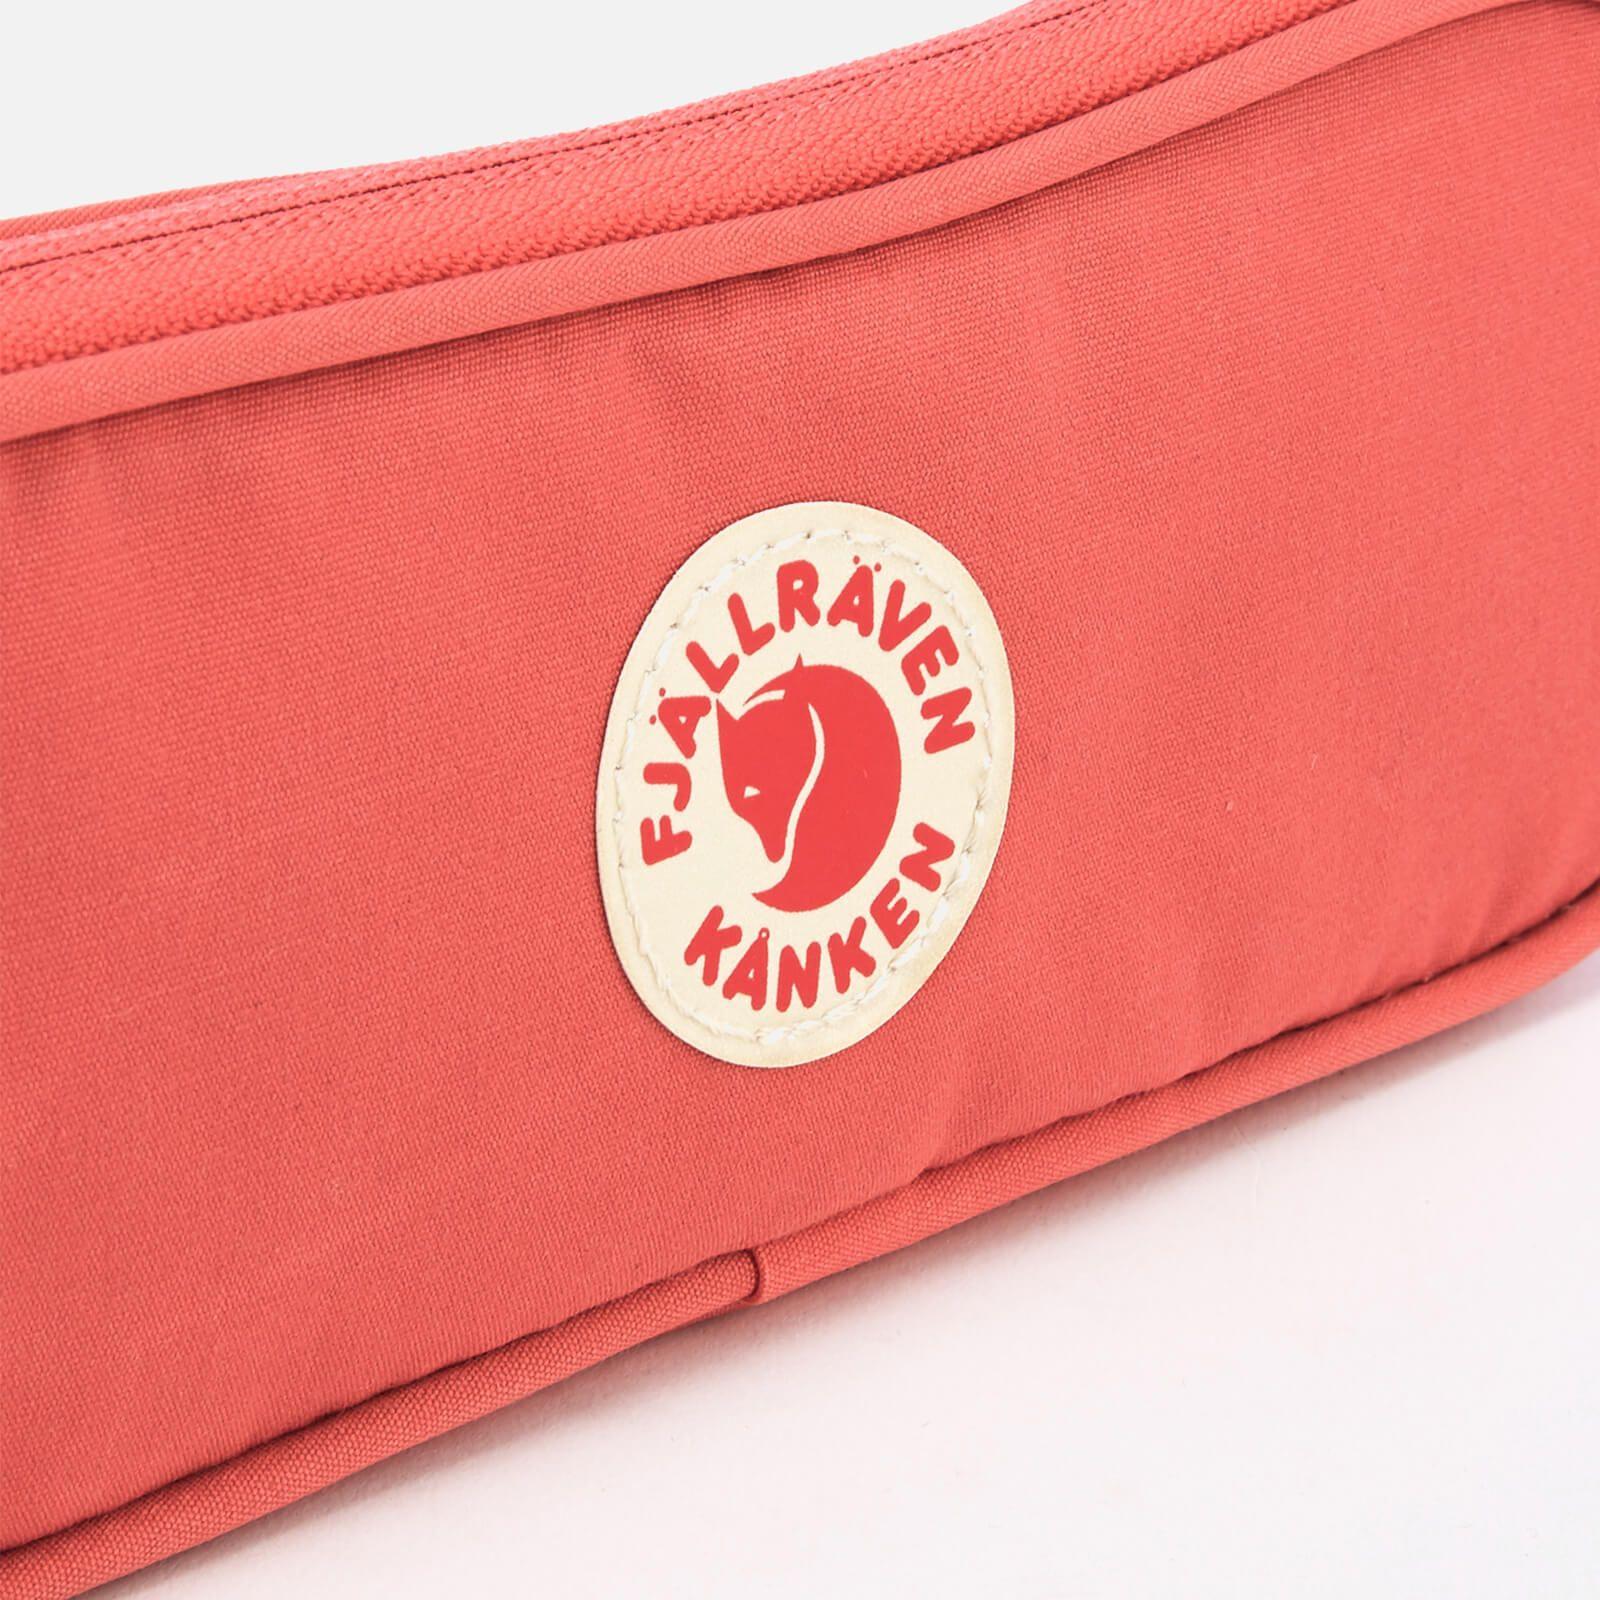 SALE EVENT Fjallraven Kanken Pen Case Peach Pink